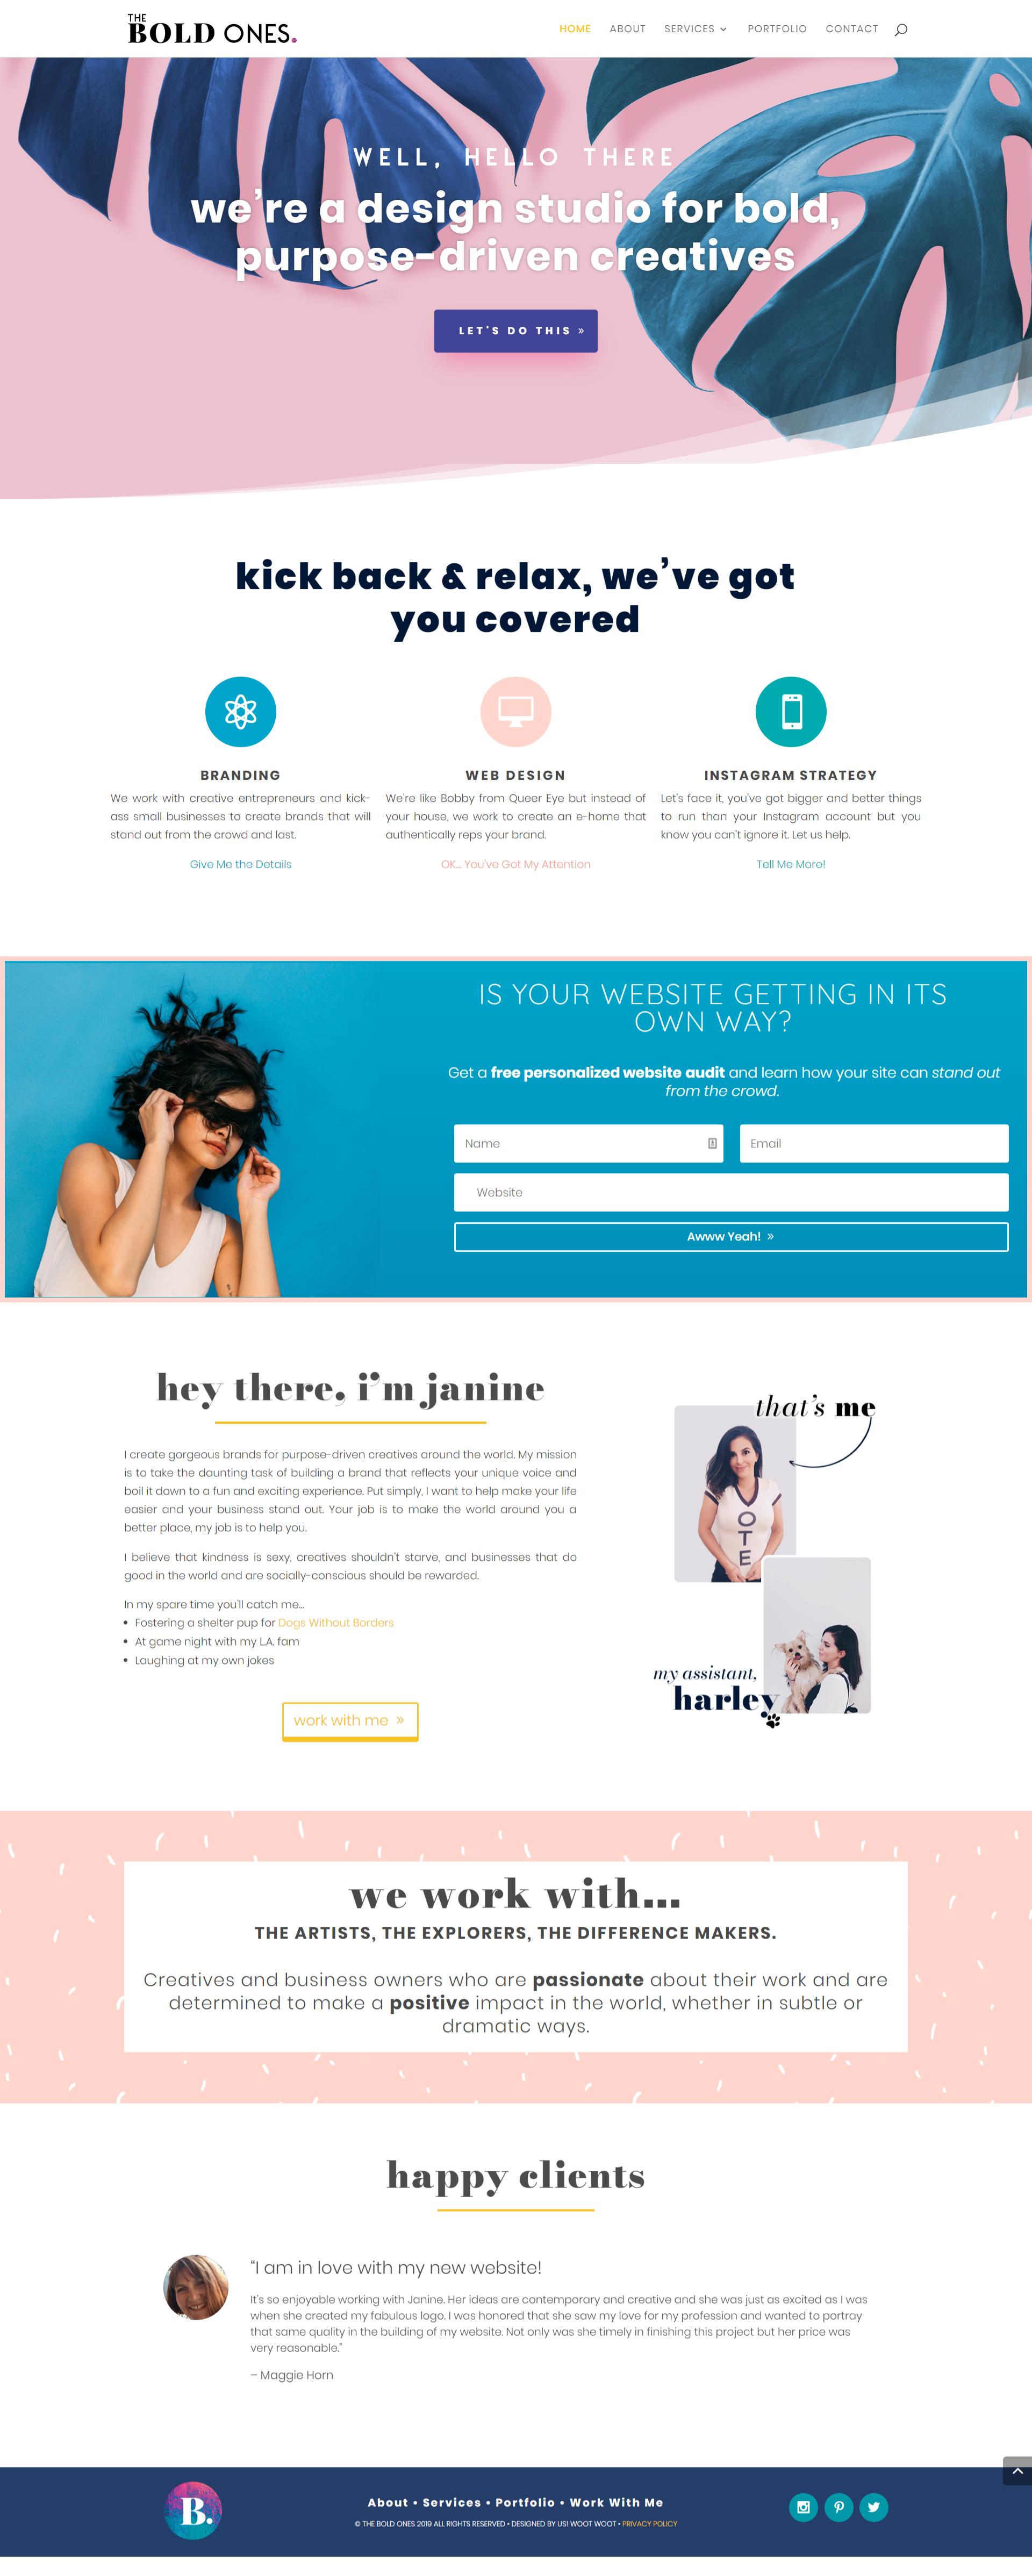 The Bold Ones Branding And Web Design Studio Homepage Layout Design For Wordpress Webdesign Studi In 2020 Homepage Layout Design Homepage Design Web Design Studio